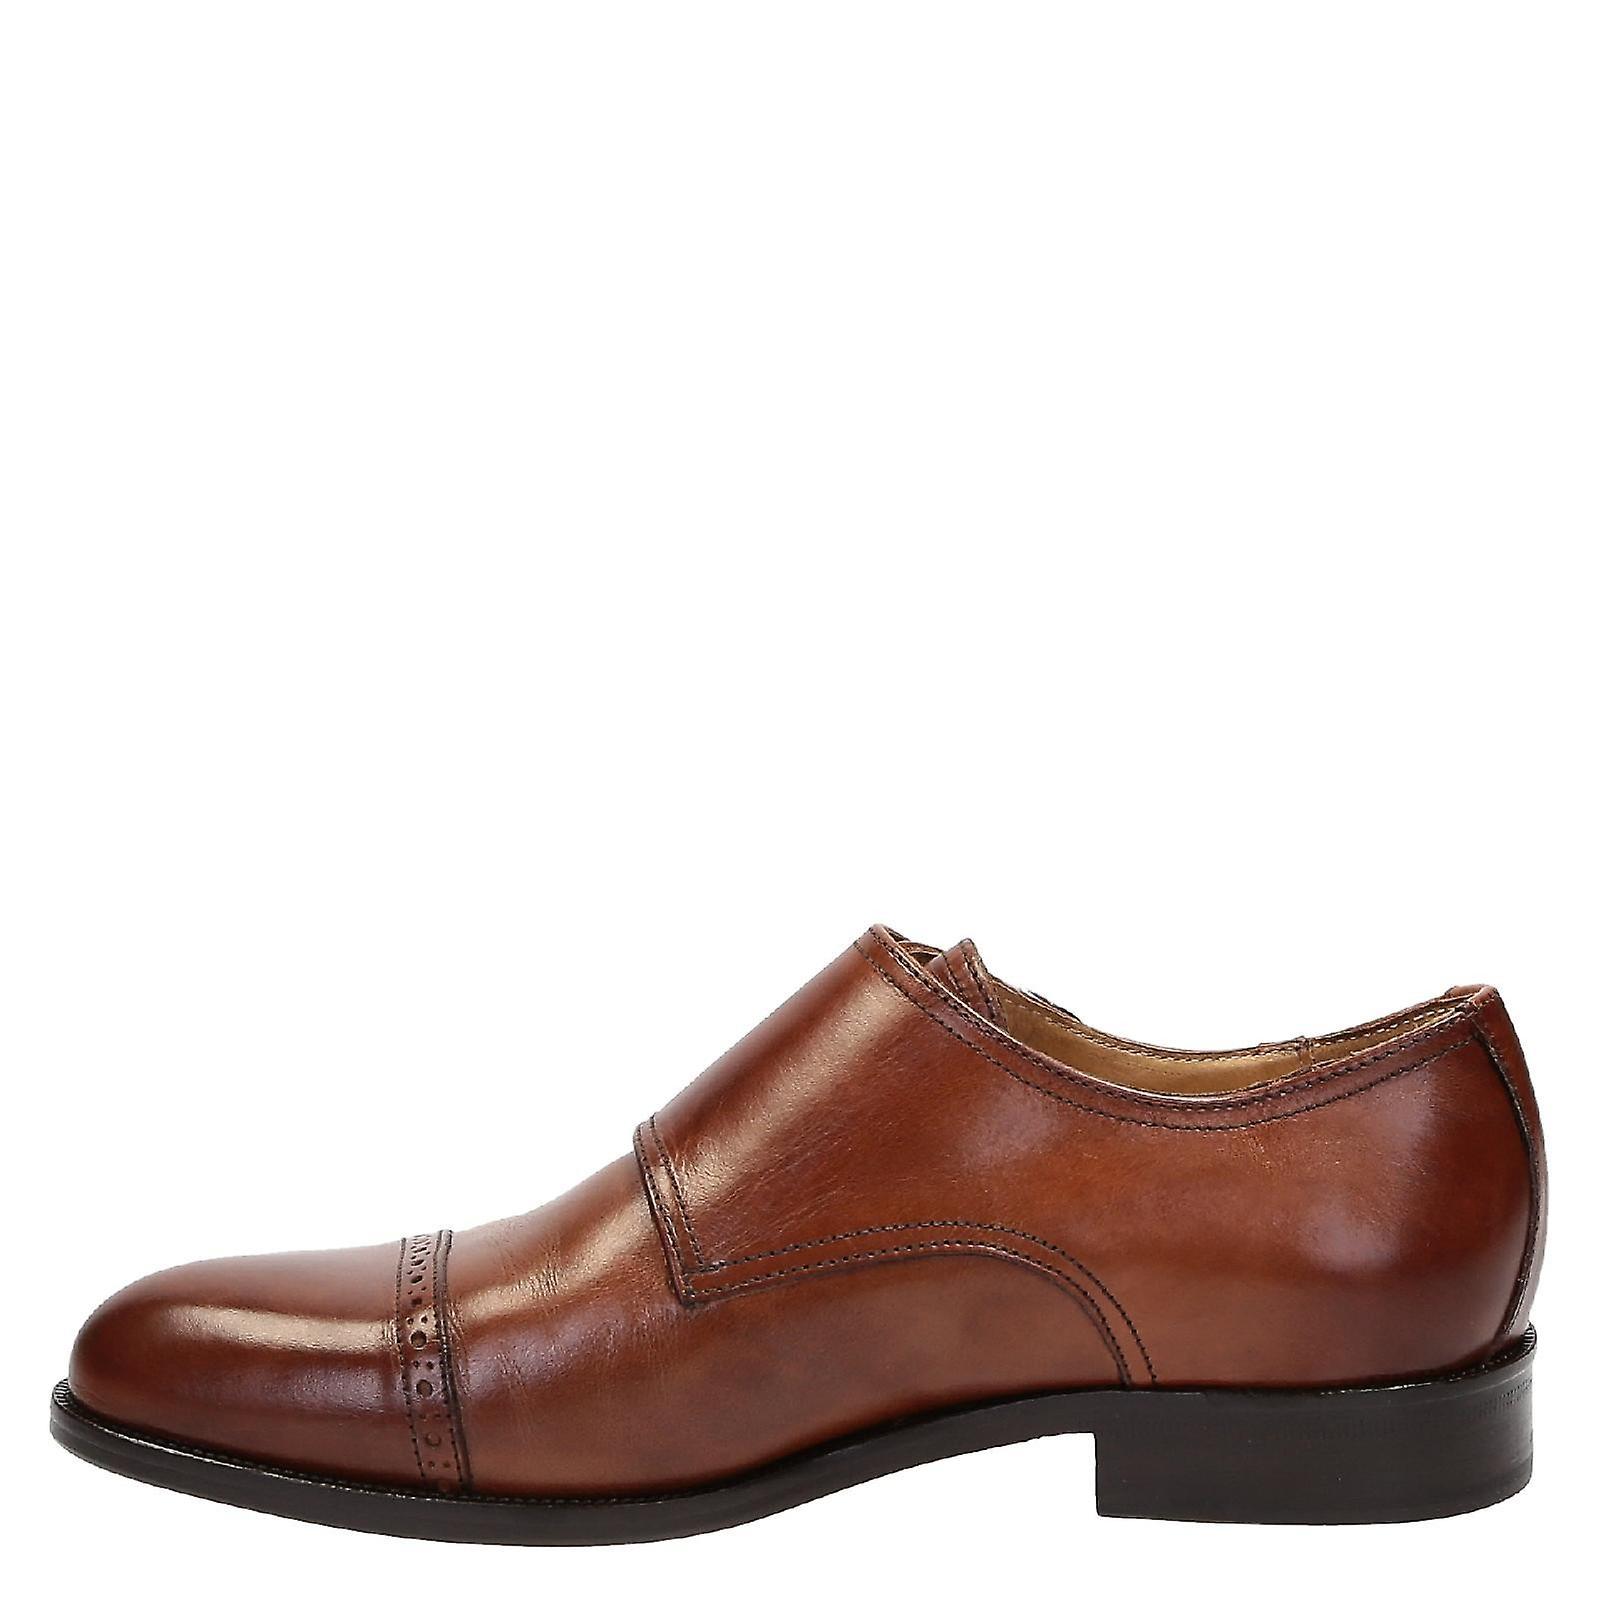 Leonardo Shoes 07169forma40fullnoce Men's Brown Leather Monk Strap Shoes 3r6sUT